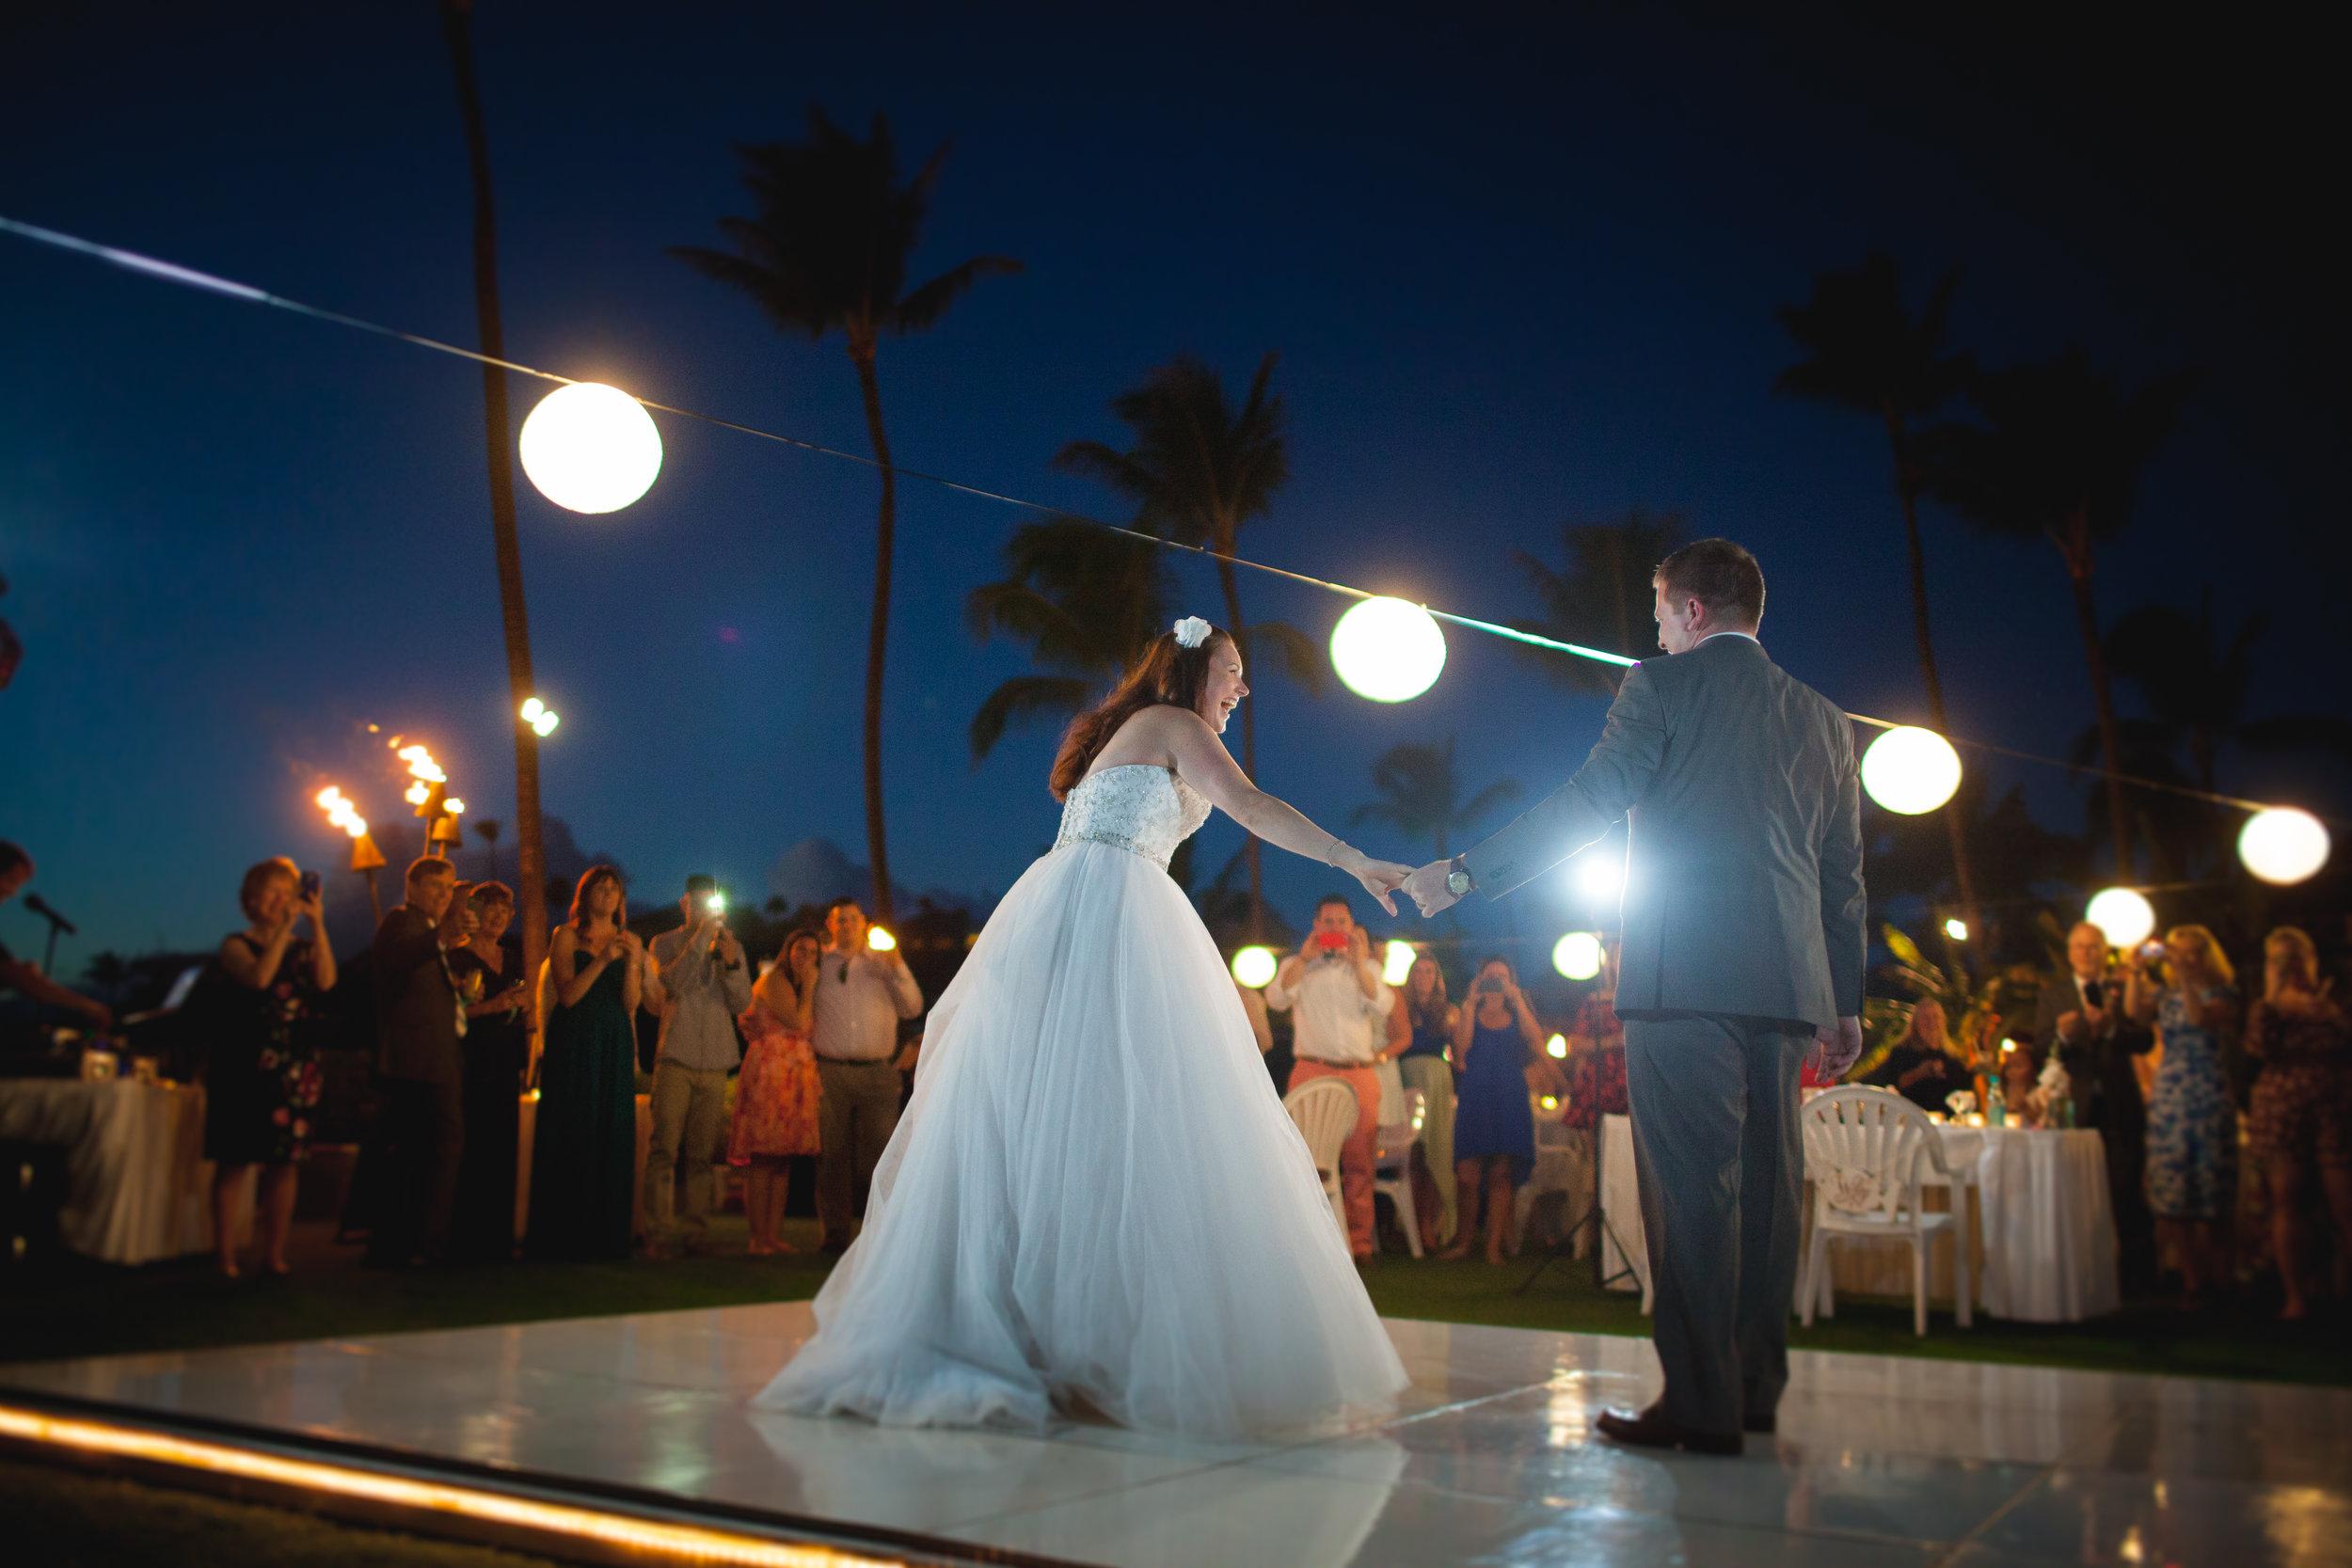 Maui Destination Wedding - Beach theme